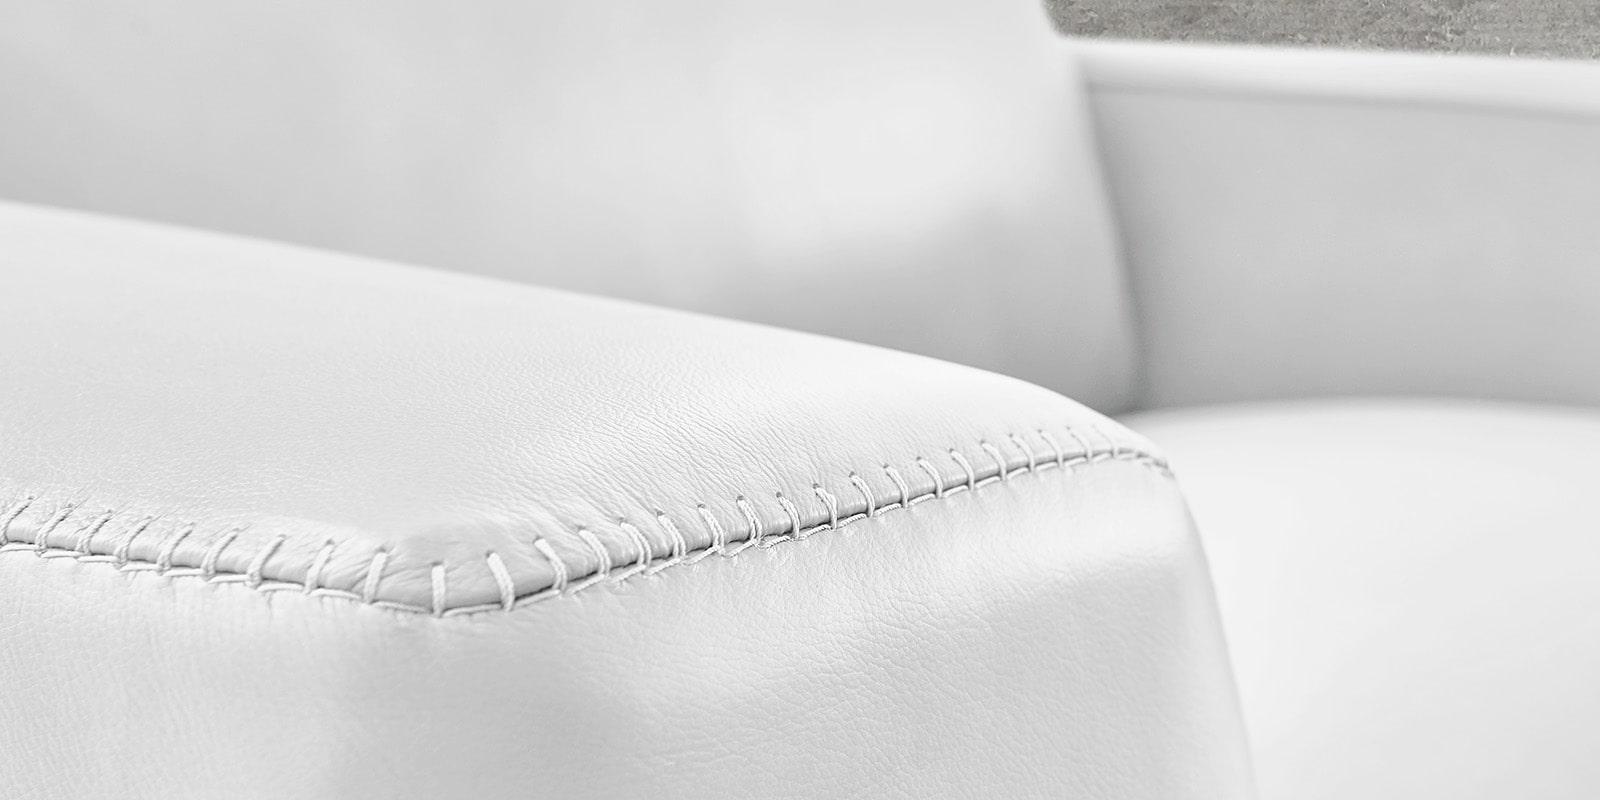 Moebella24 - 1,5-Sitzer - Sessel - Sofa - Barcelona - Leder - Weiß - Skandinavisches - Design - Punto - cavallo - Nähte - Detailaufnahme